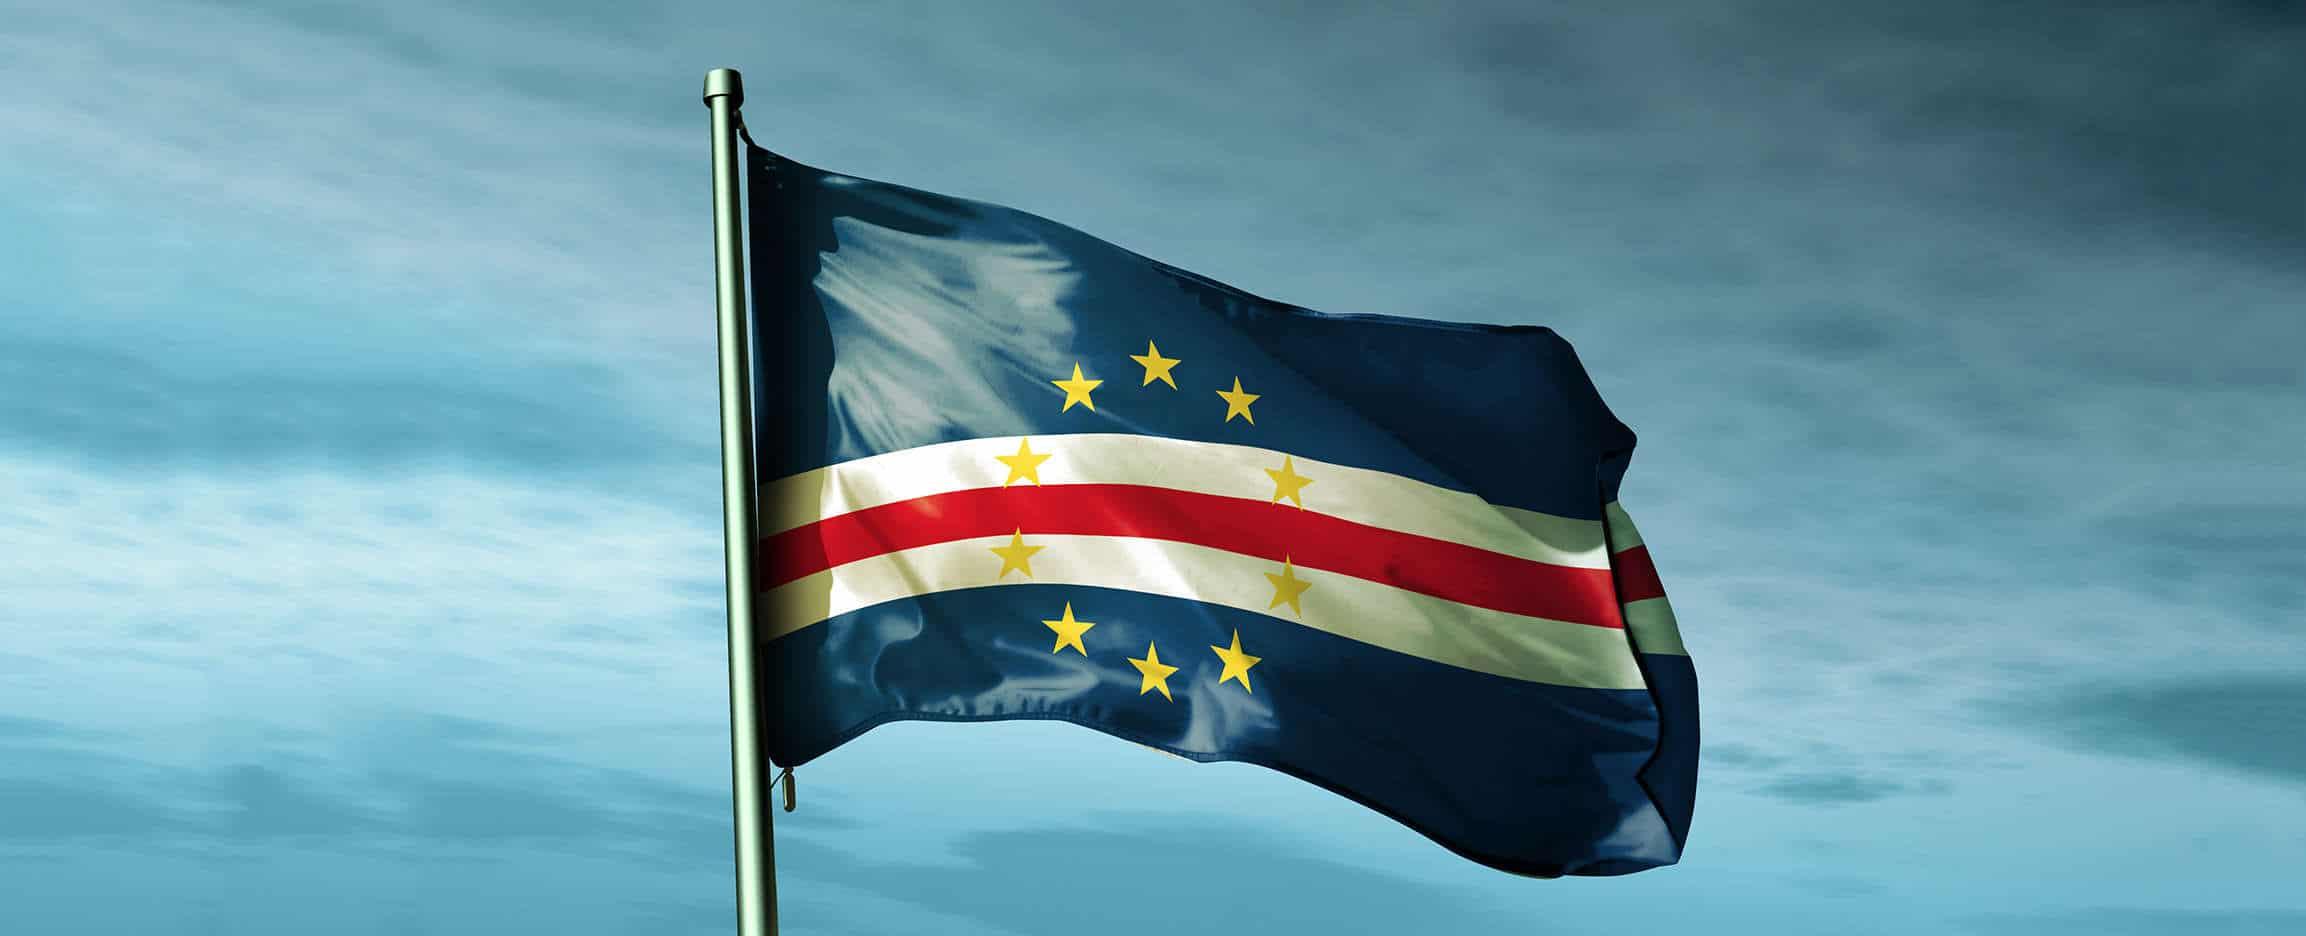 curiosidades de Cabo Verde bandera